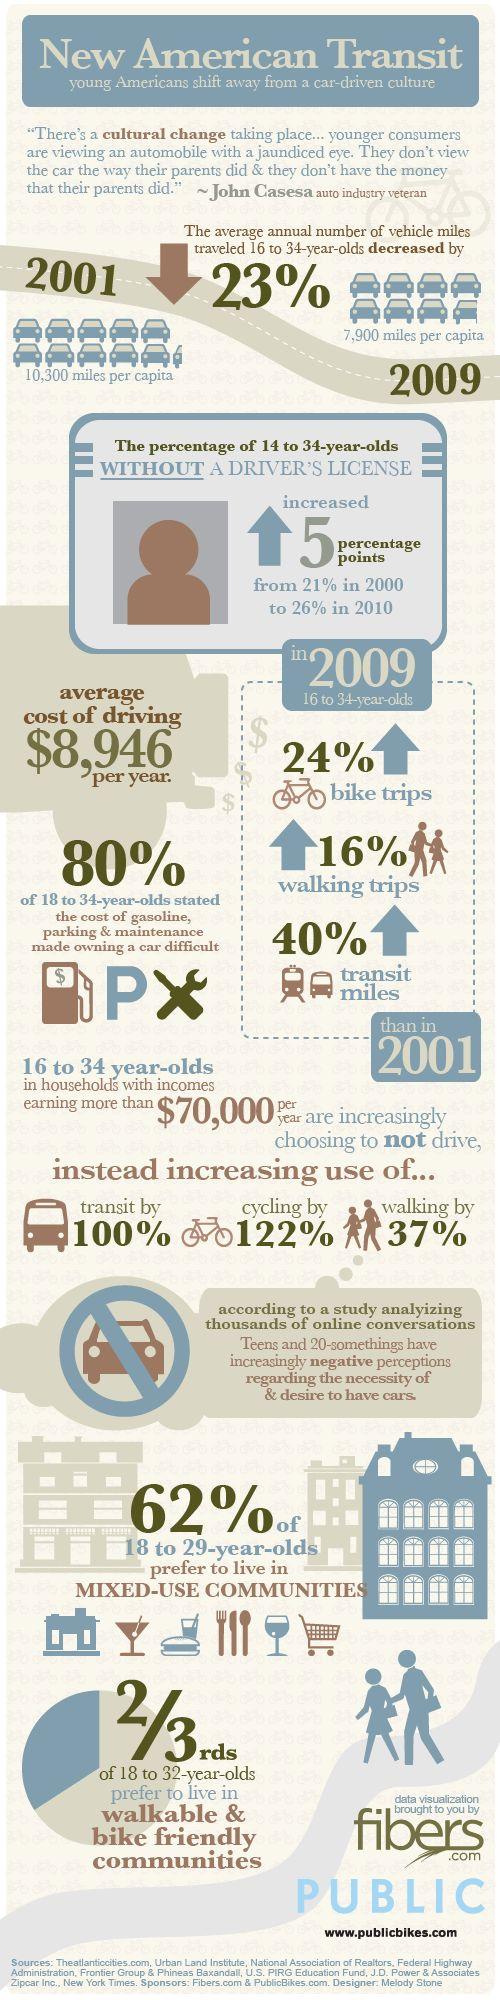 New American Transit Infographic